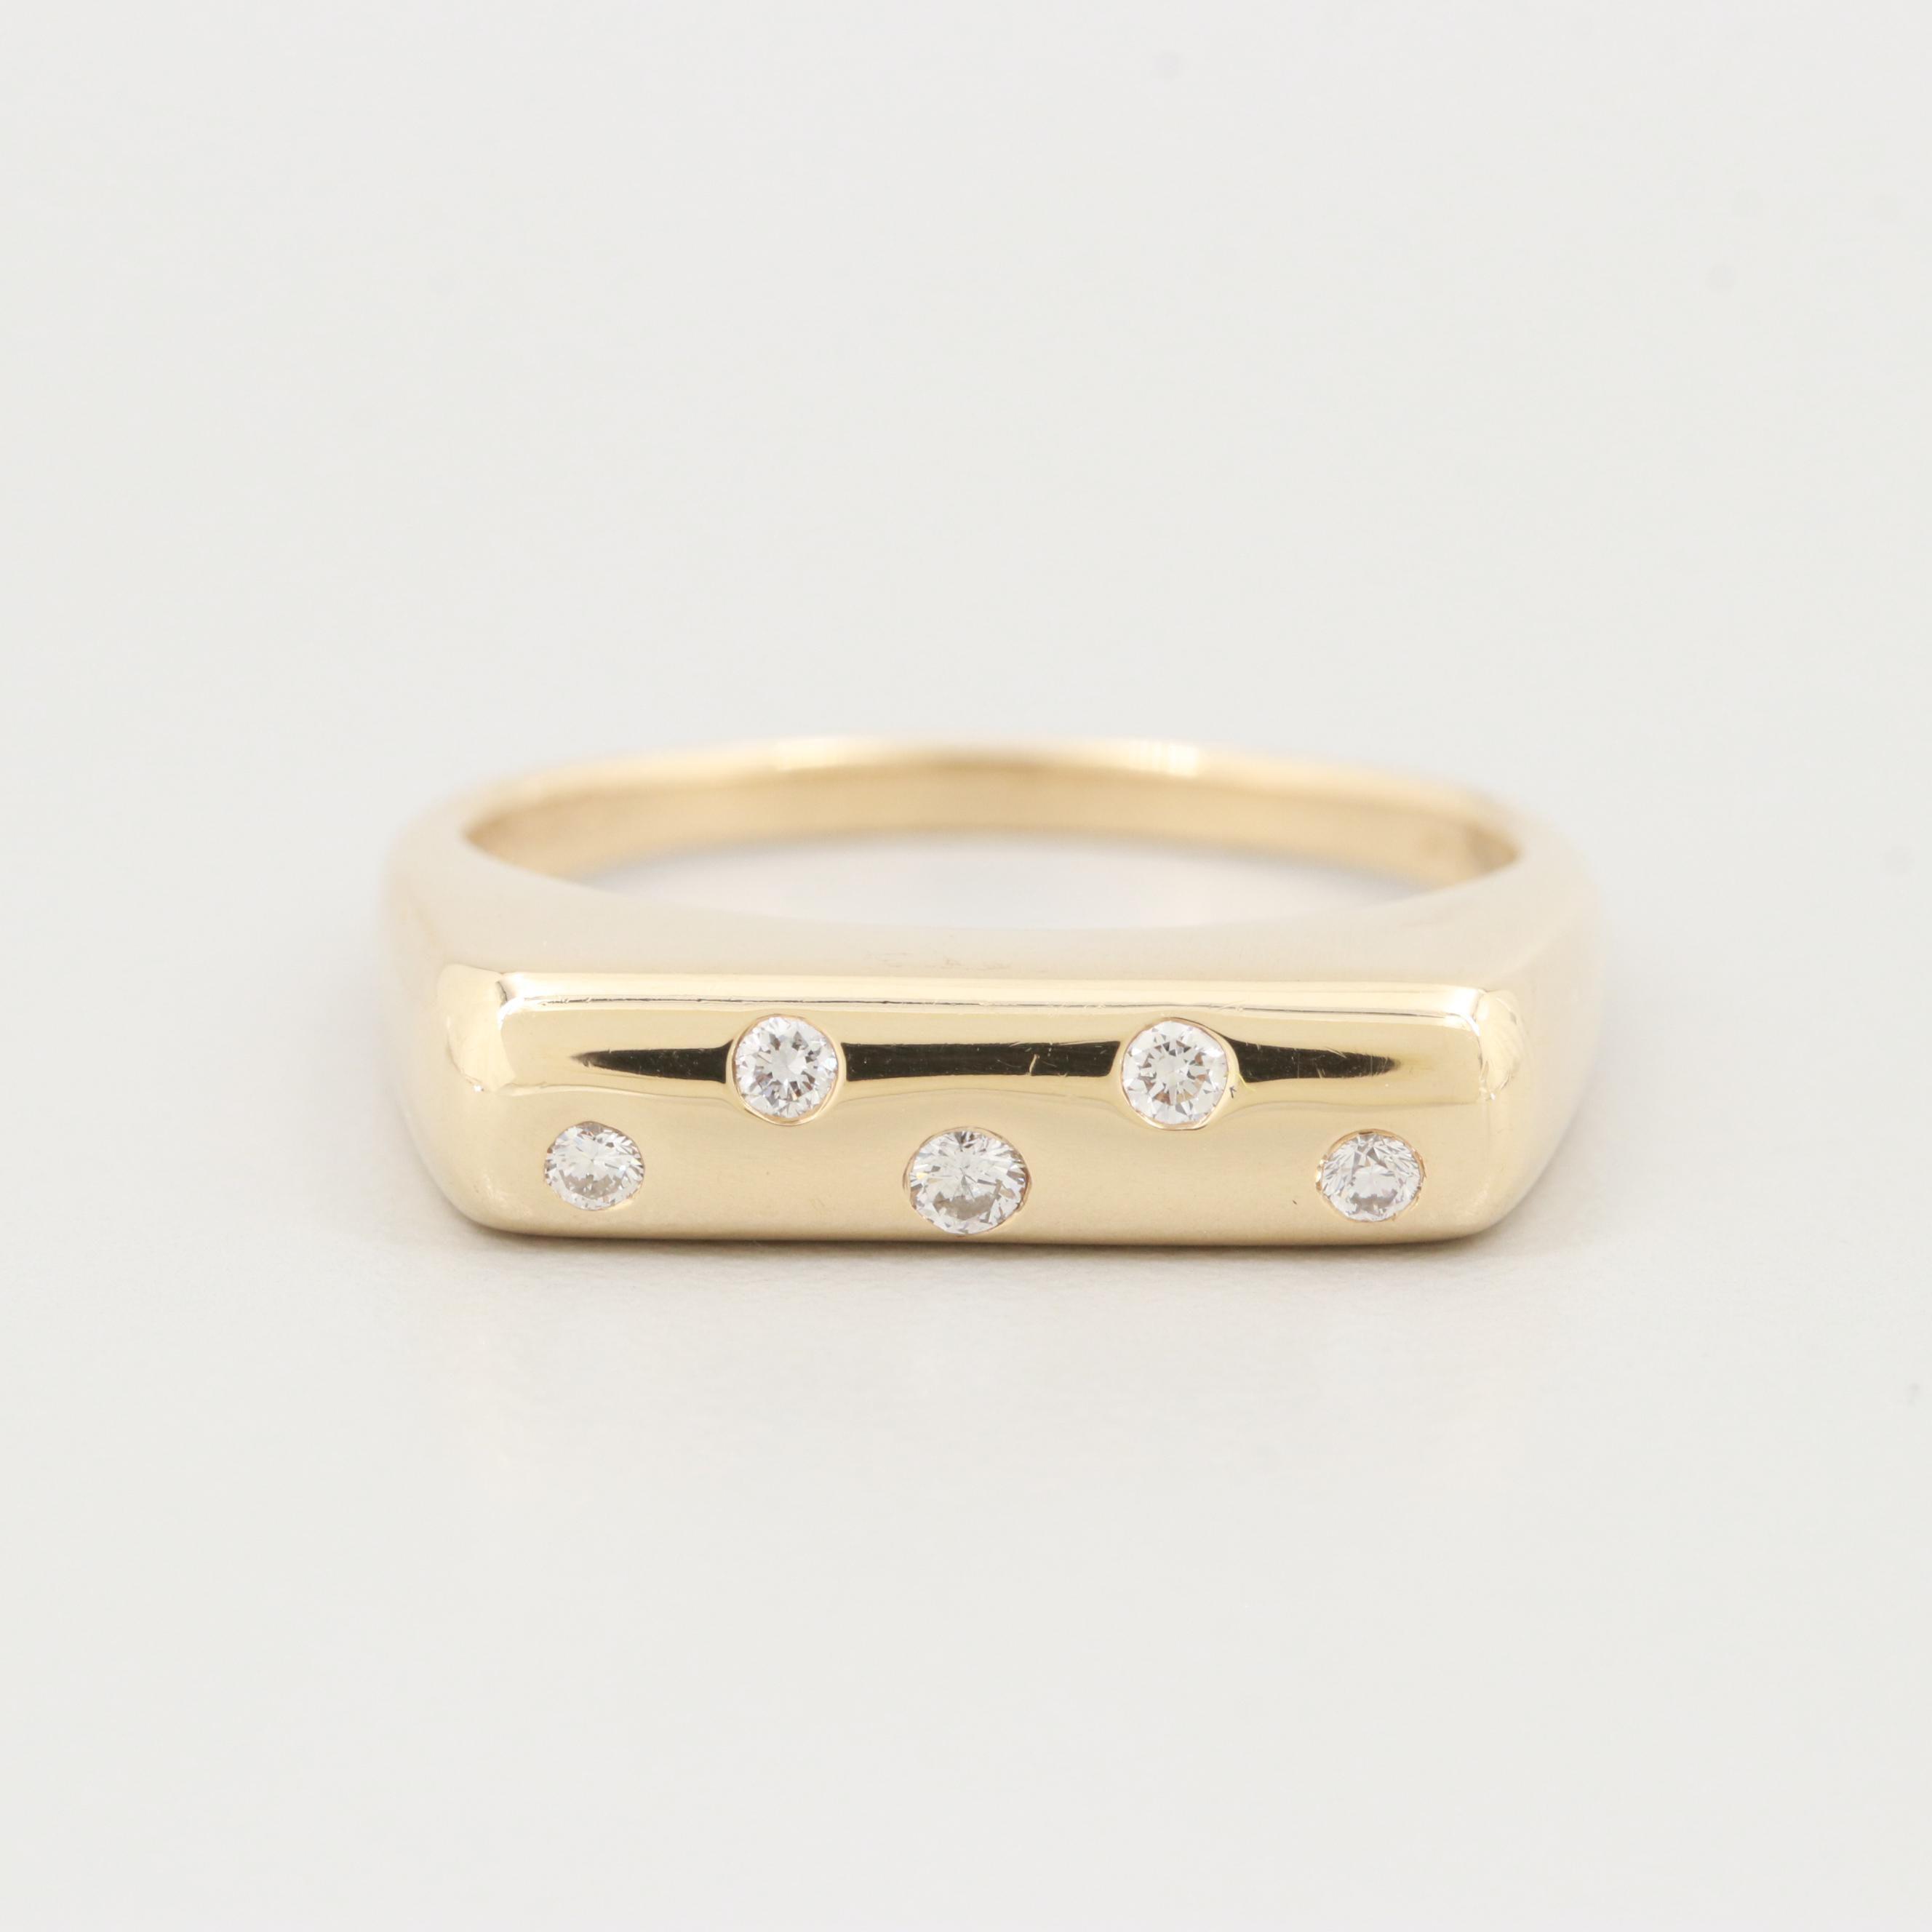 Sonia Bitton 14K Yellow Gold Diamond Ring